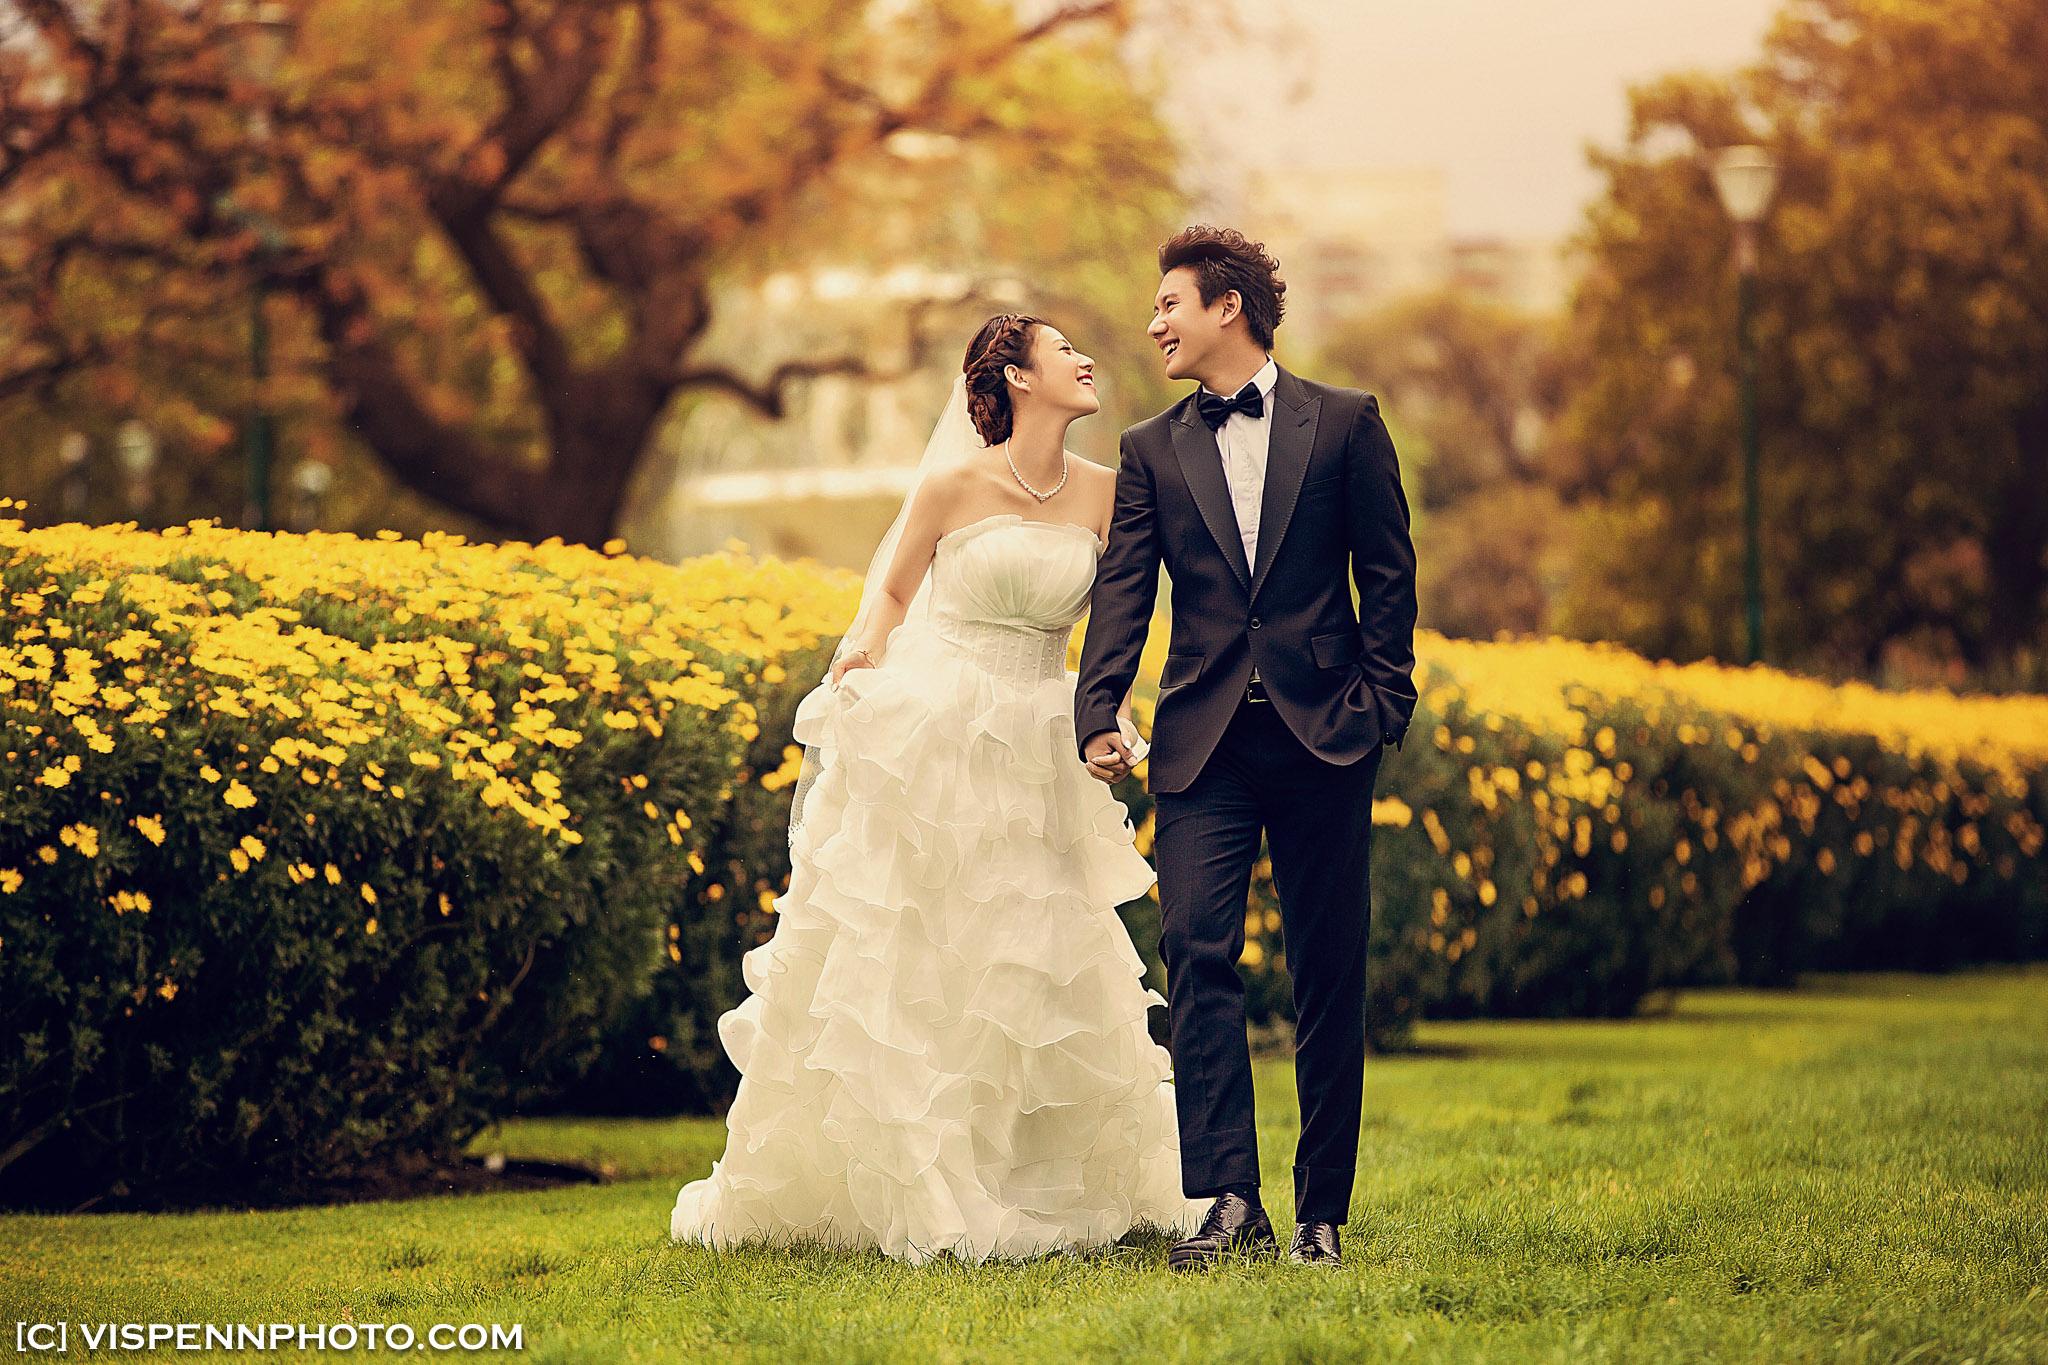 PRE WEDDING Photography Melbourne VISPENN 墨尔本 婚纱照 结婚照 婚纱摄影 5D3 3297